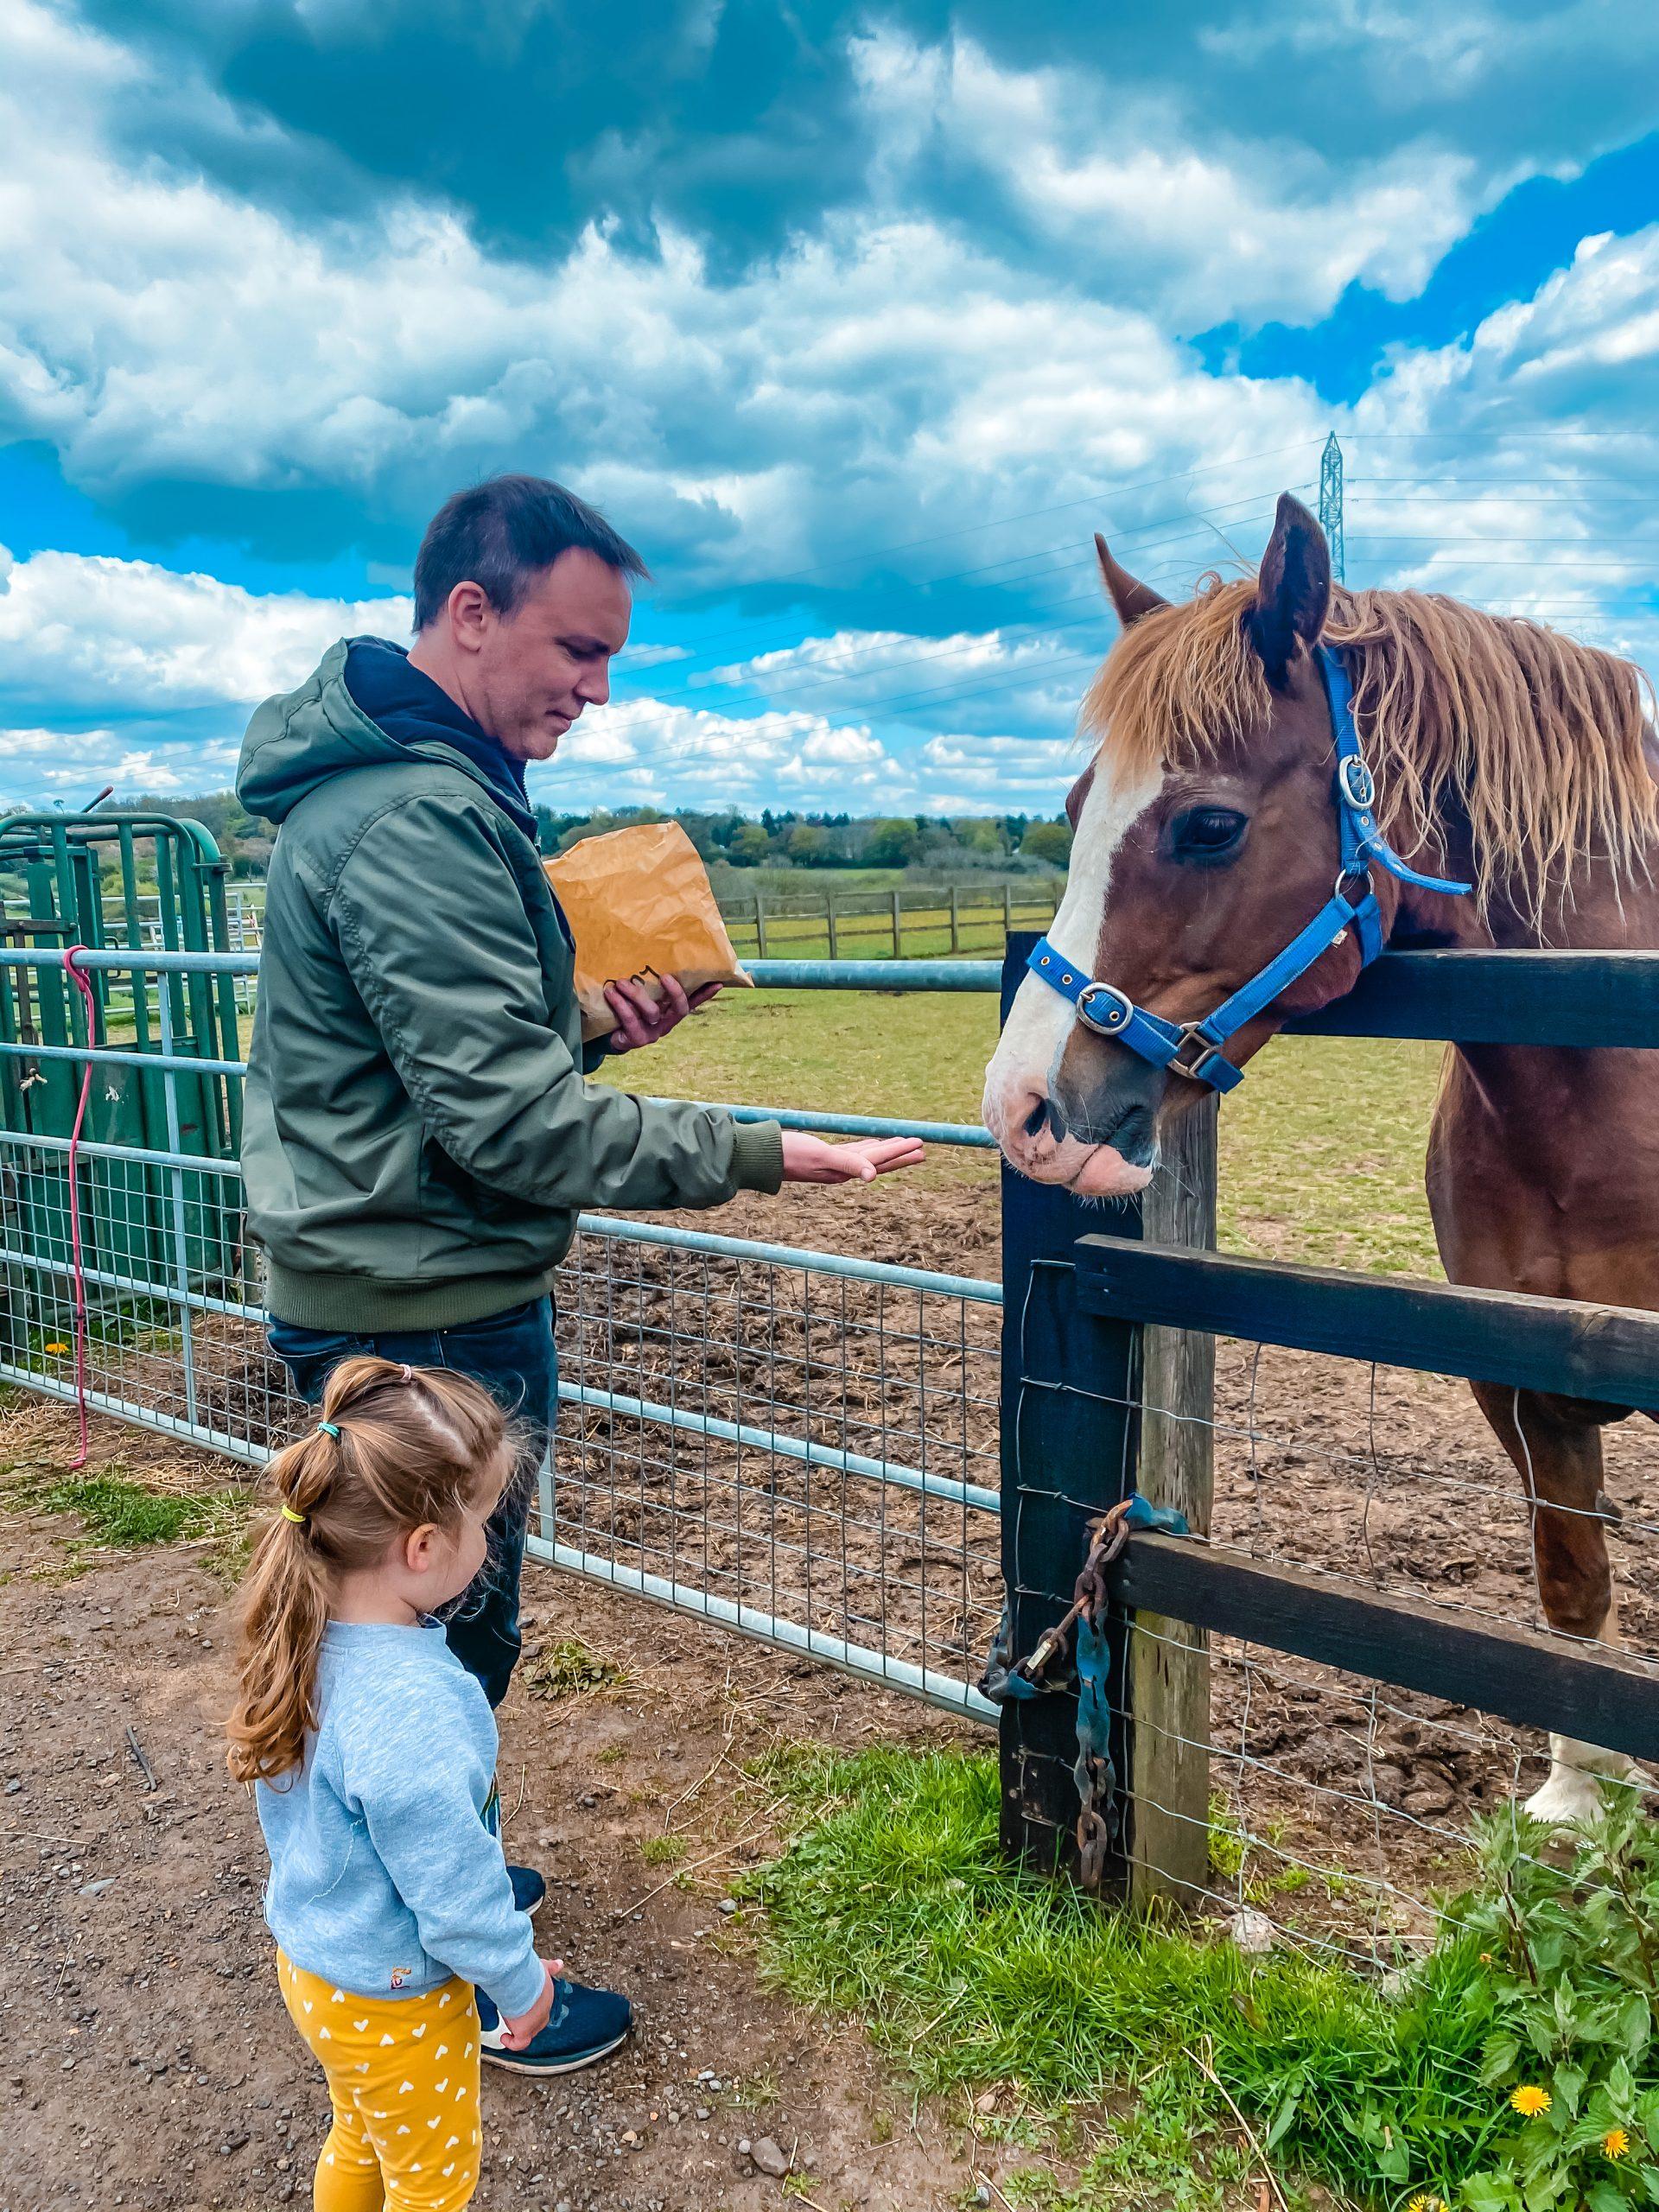 Feeding the horses at Nathan's Farm